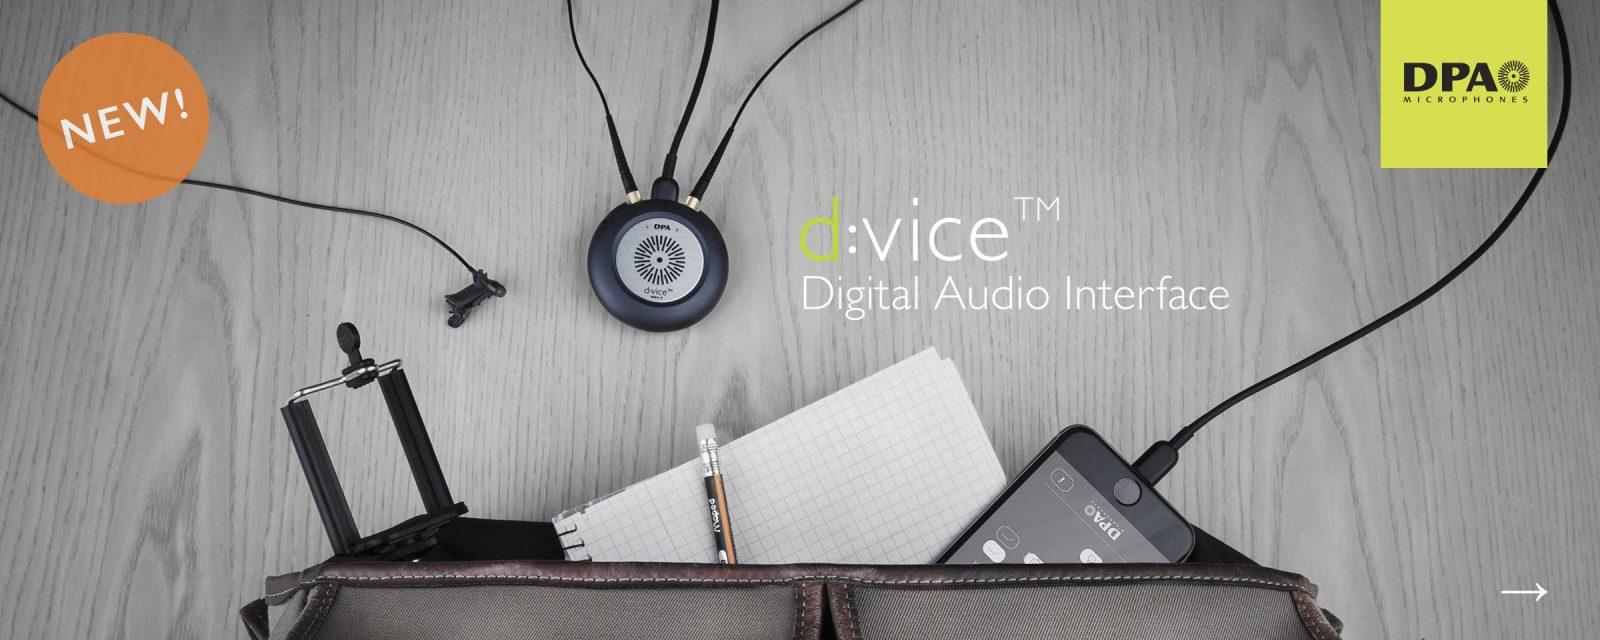 DPA d:vice™ Digital Audio Interface